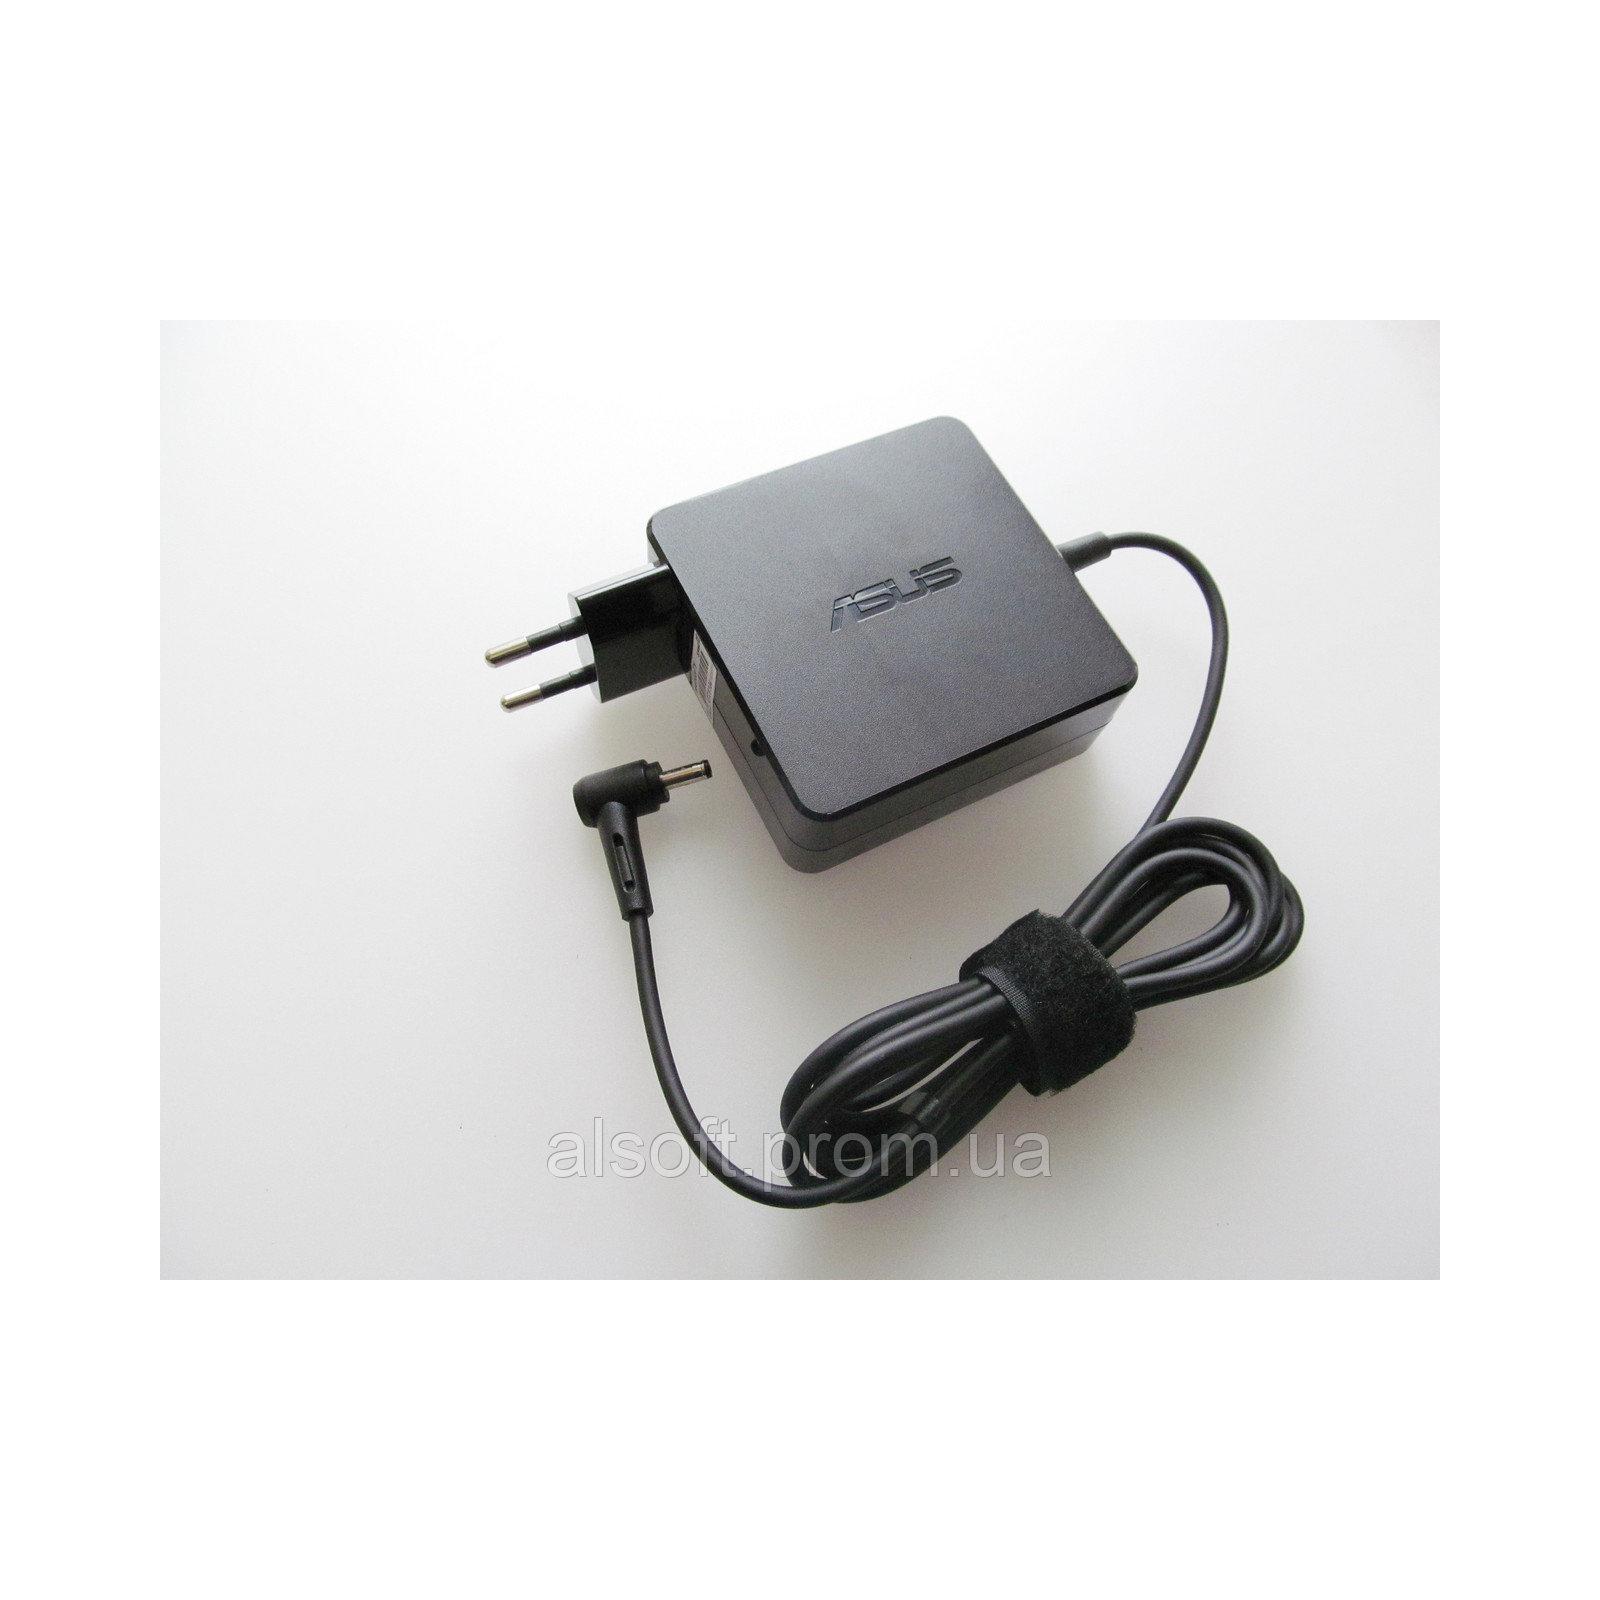 Блок питания к ноутбуку ASUS 65W Zenbook 19V 3.42A разъем 4.0/1.35 (ADP-65AW A)